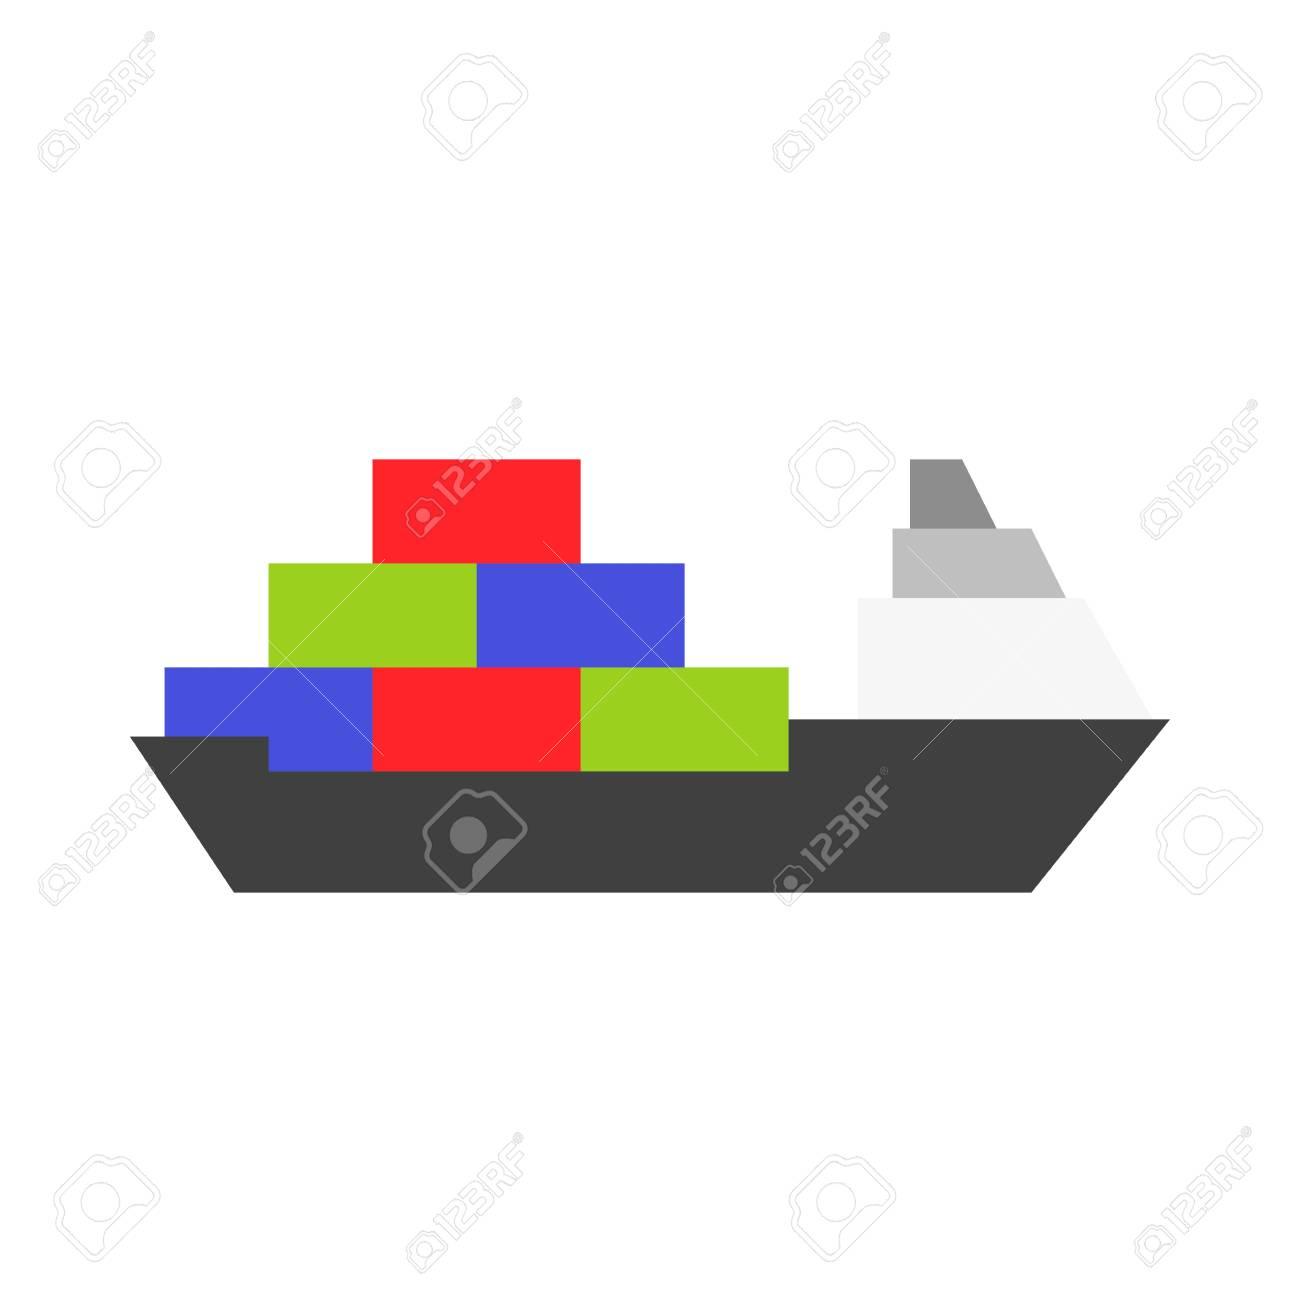 hight resolution of cargo ship vector illustration watercraft flat design icon stock vector 114298398